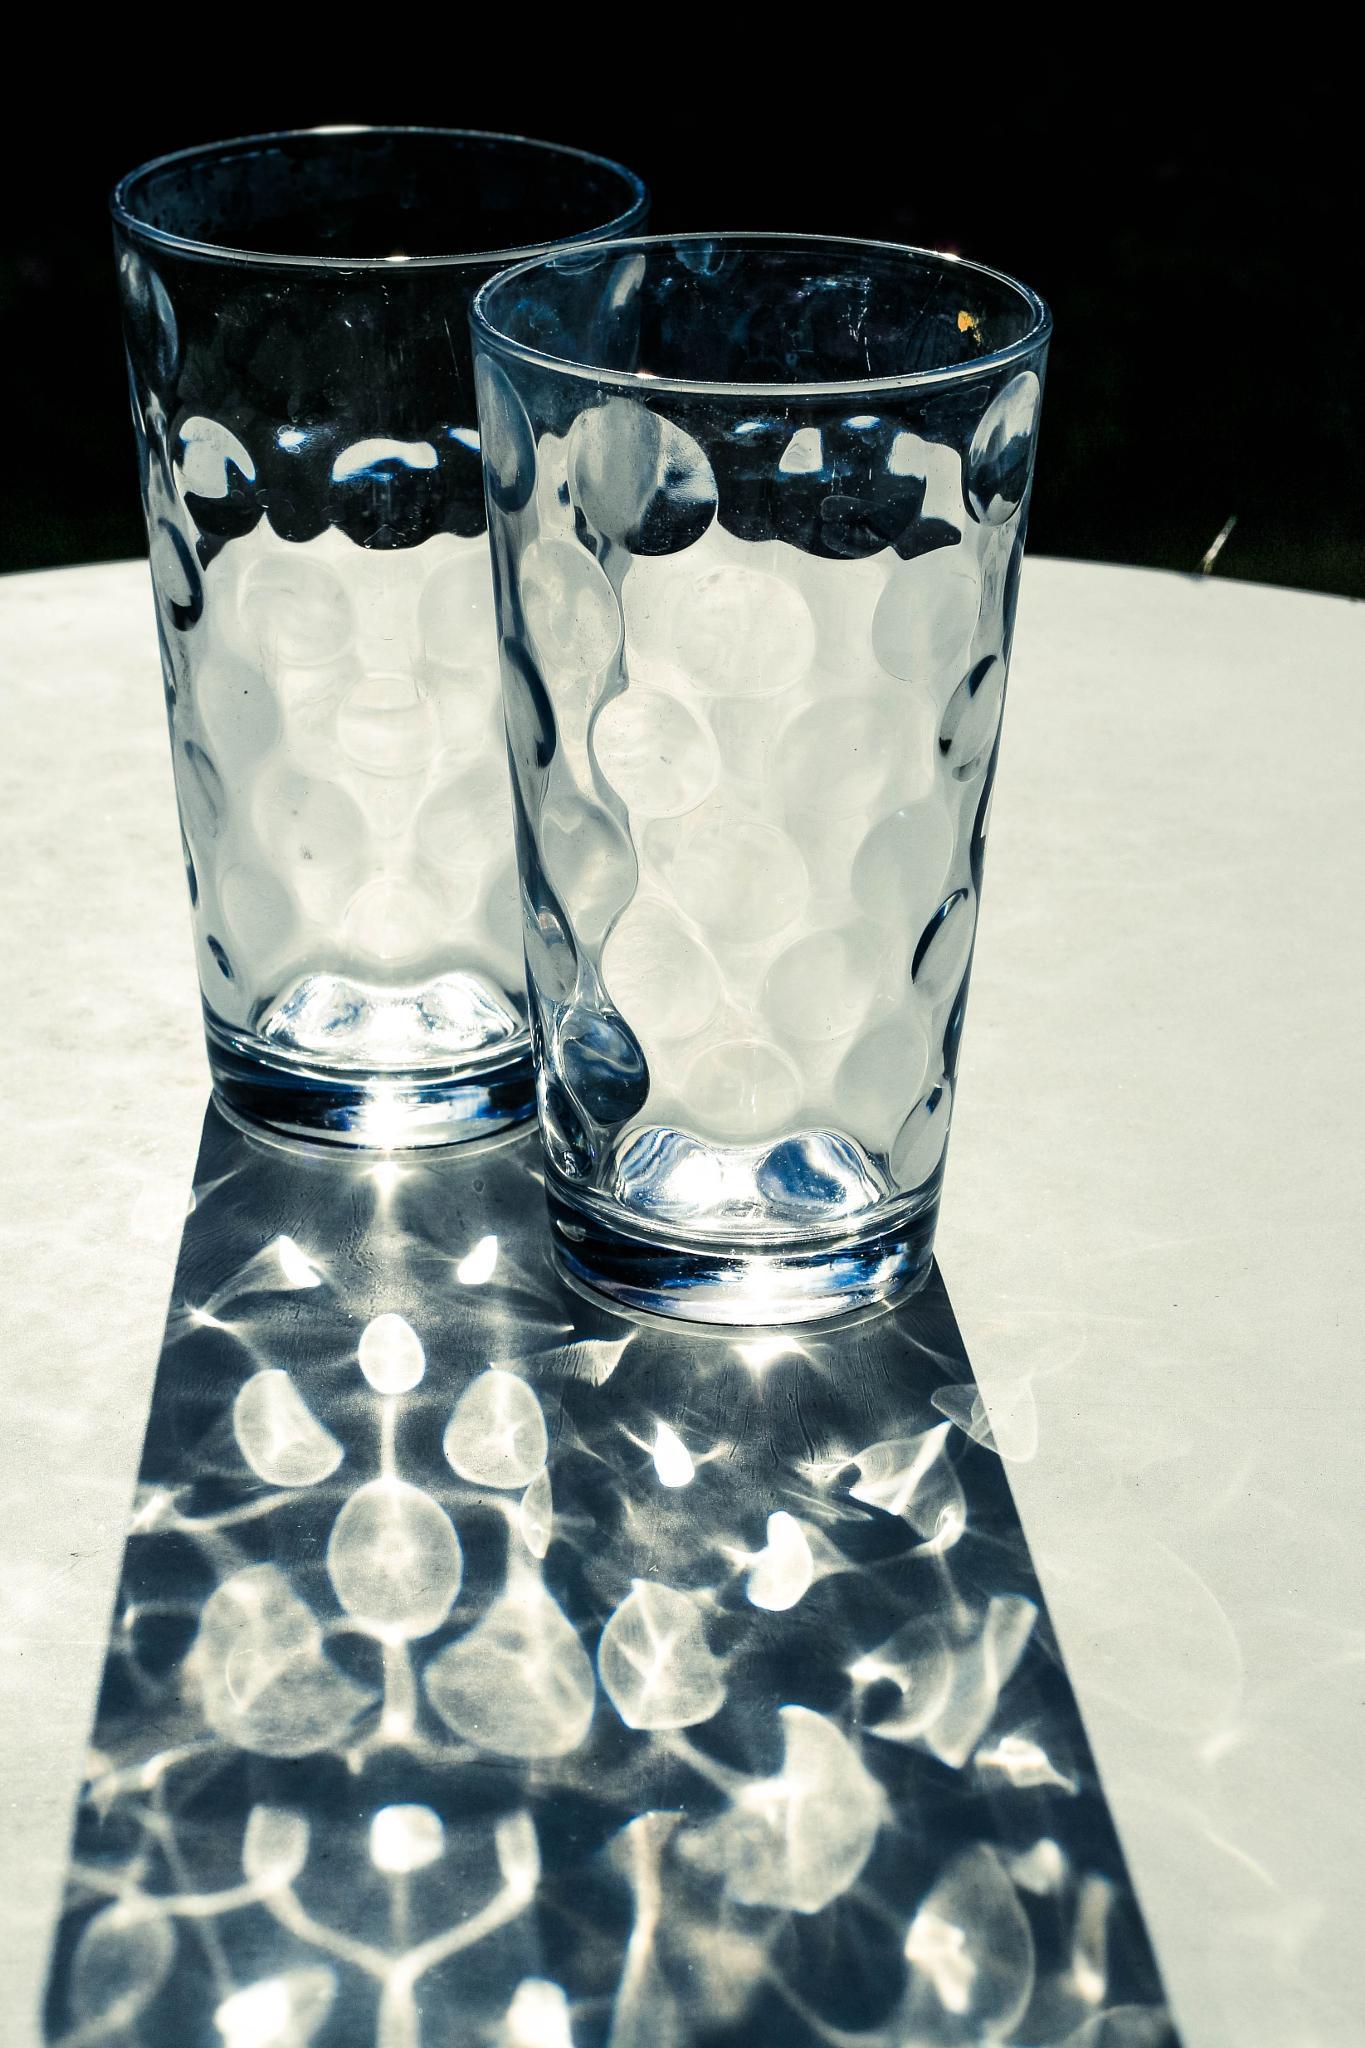 Glass Light 3 by bill.pritchard.581